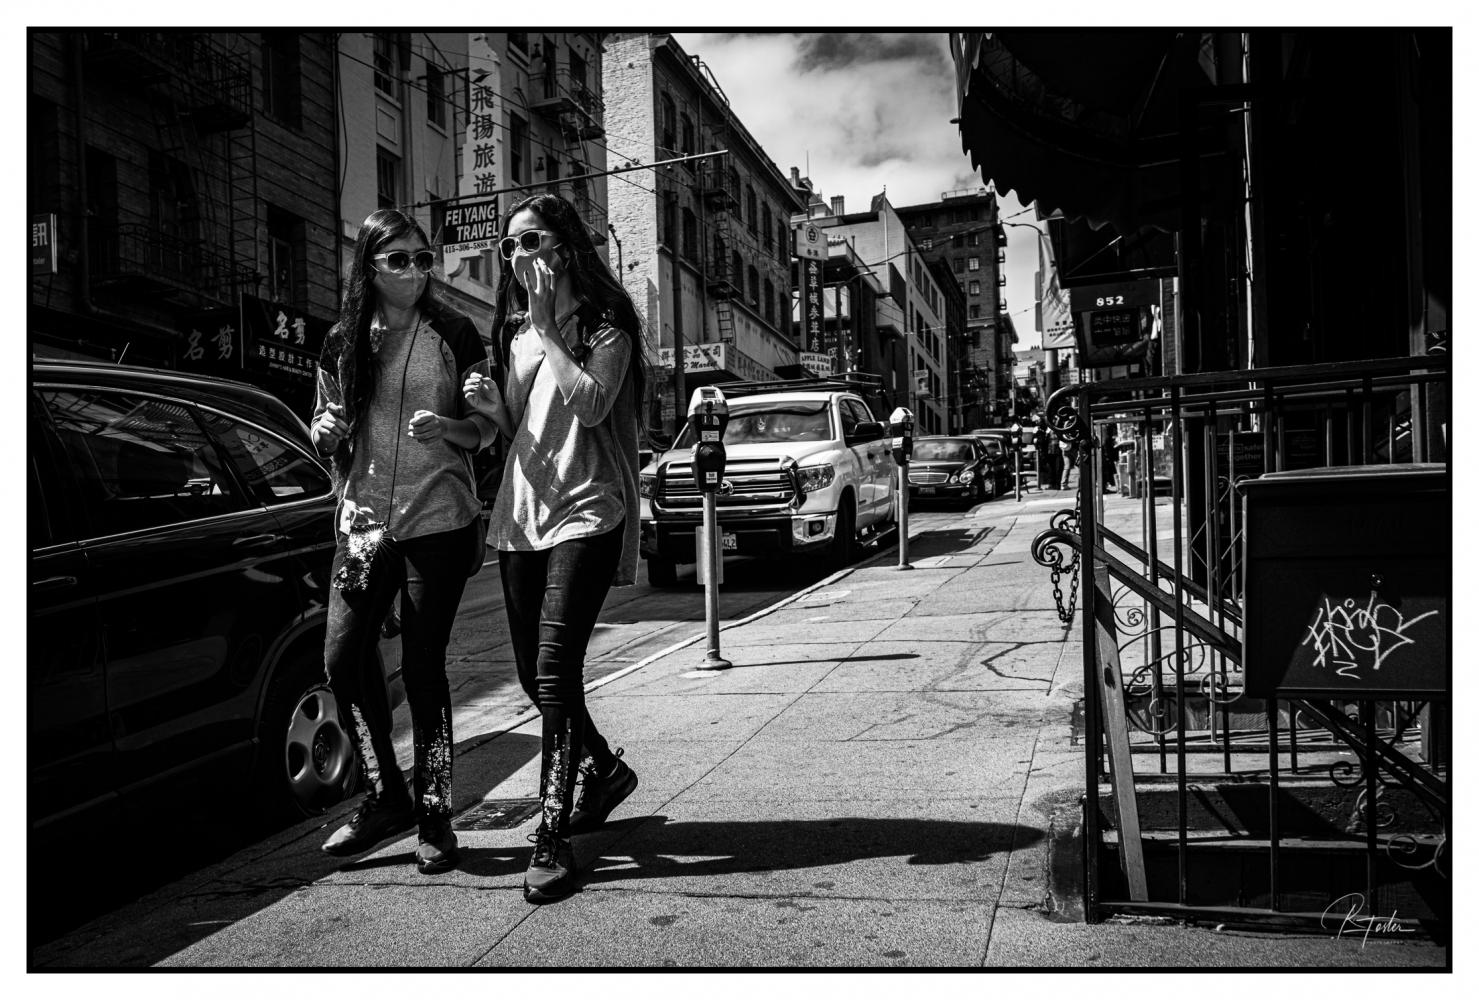 Twins Chatting, ©2021 Reginald Foster